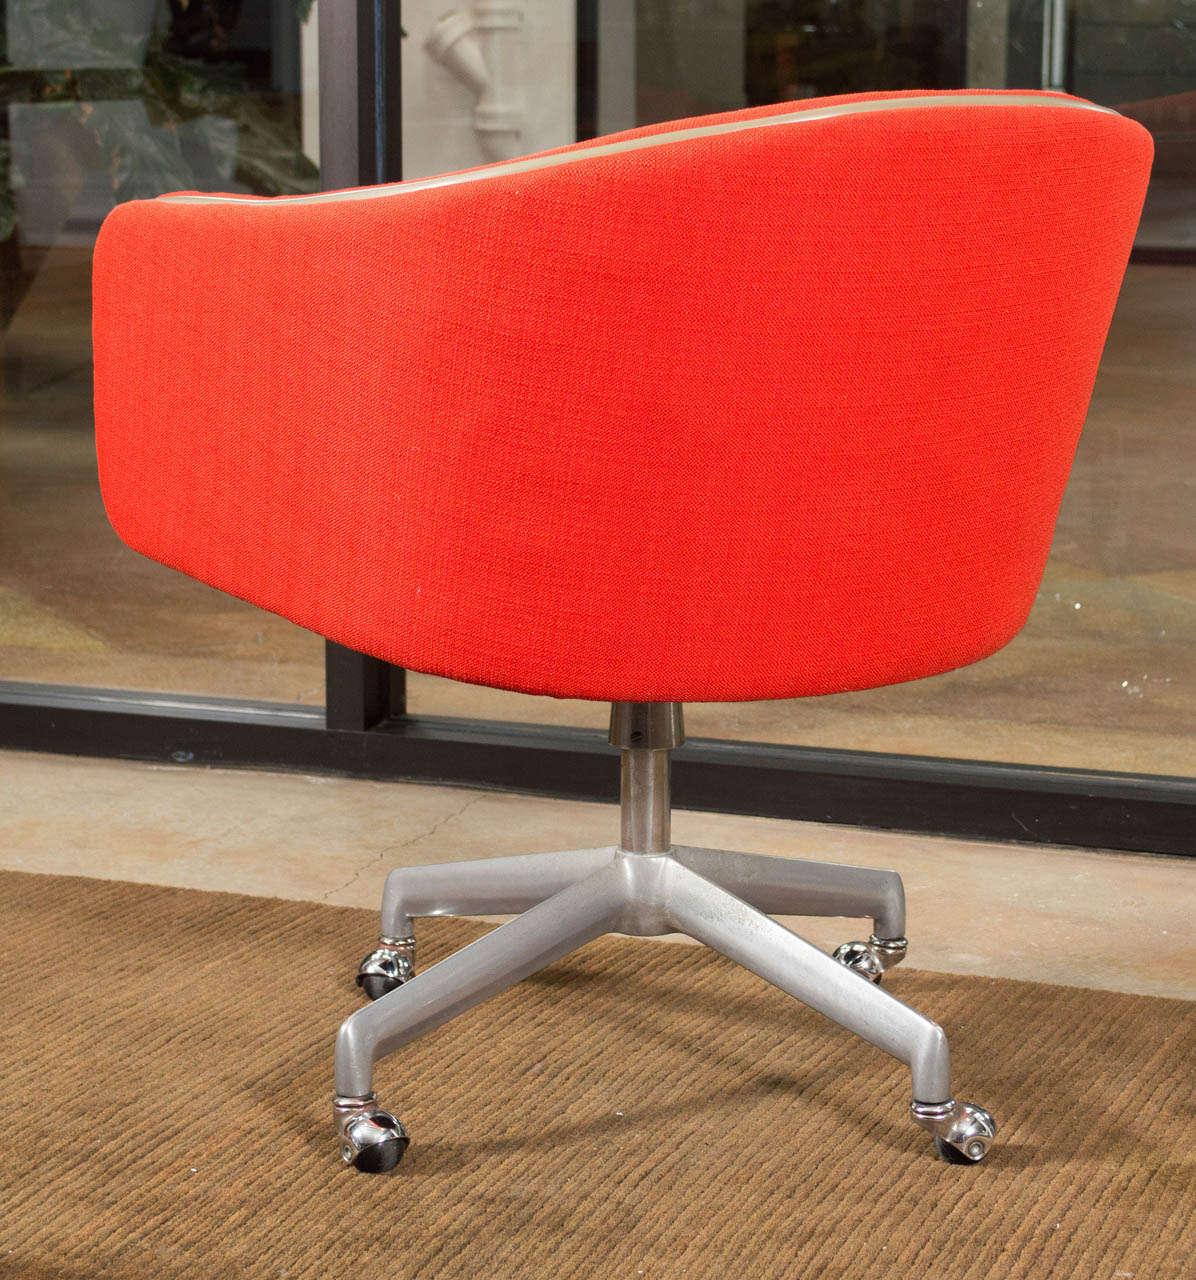 red desk chair no wheels children s beach with umbrella shoulder straps alexander girard swivel office for sale at 1stdibs